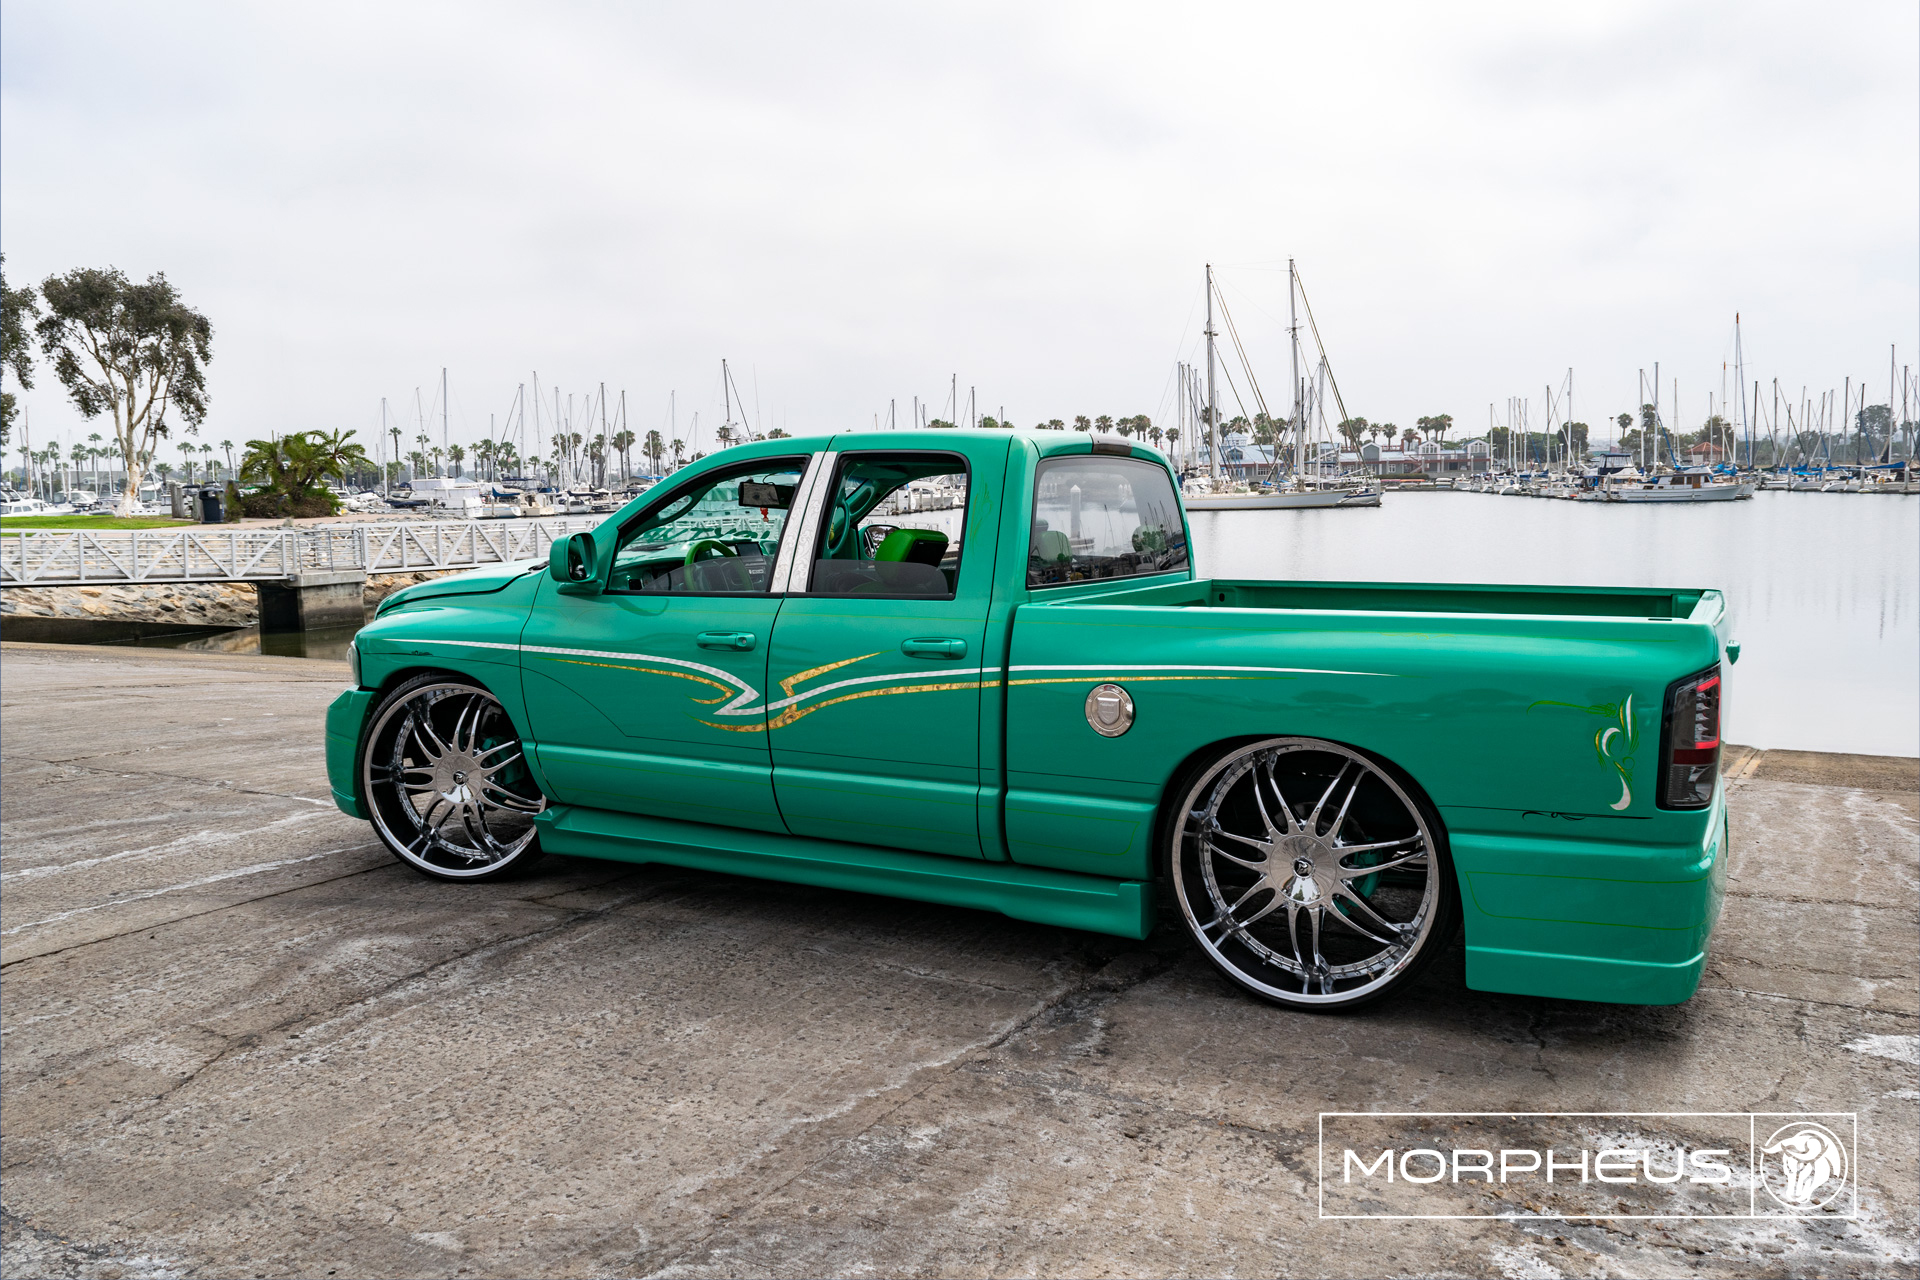 Morpheus Diablo Wheels RAM Truck